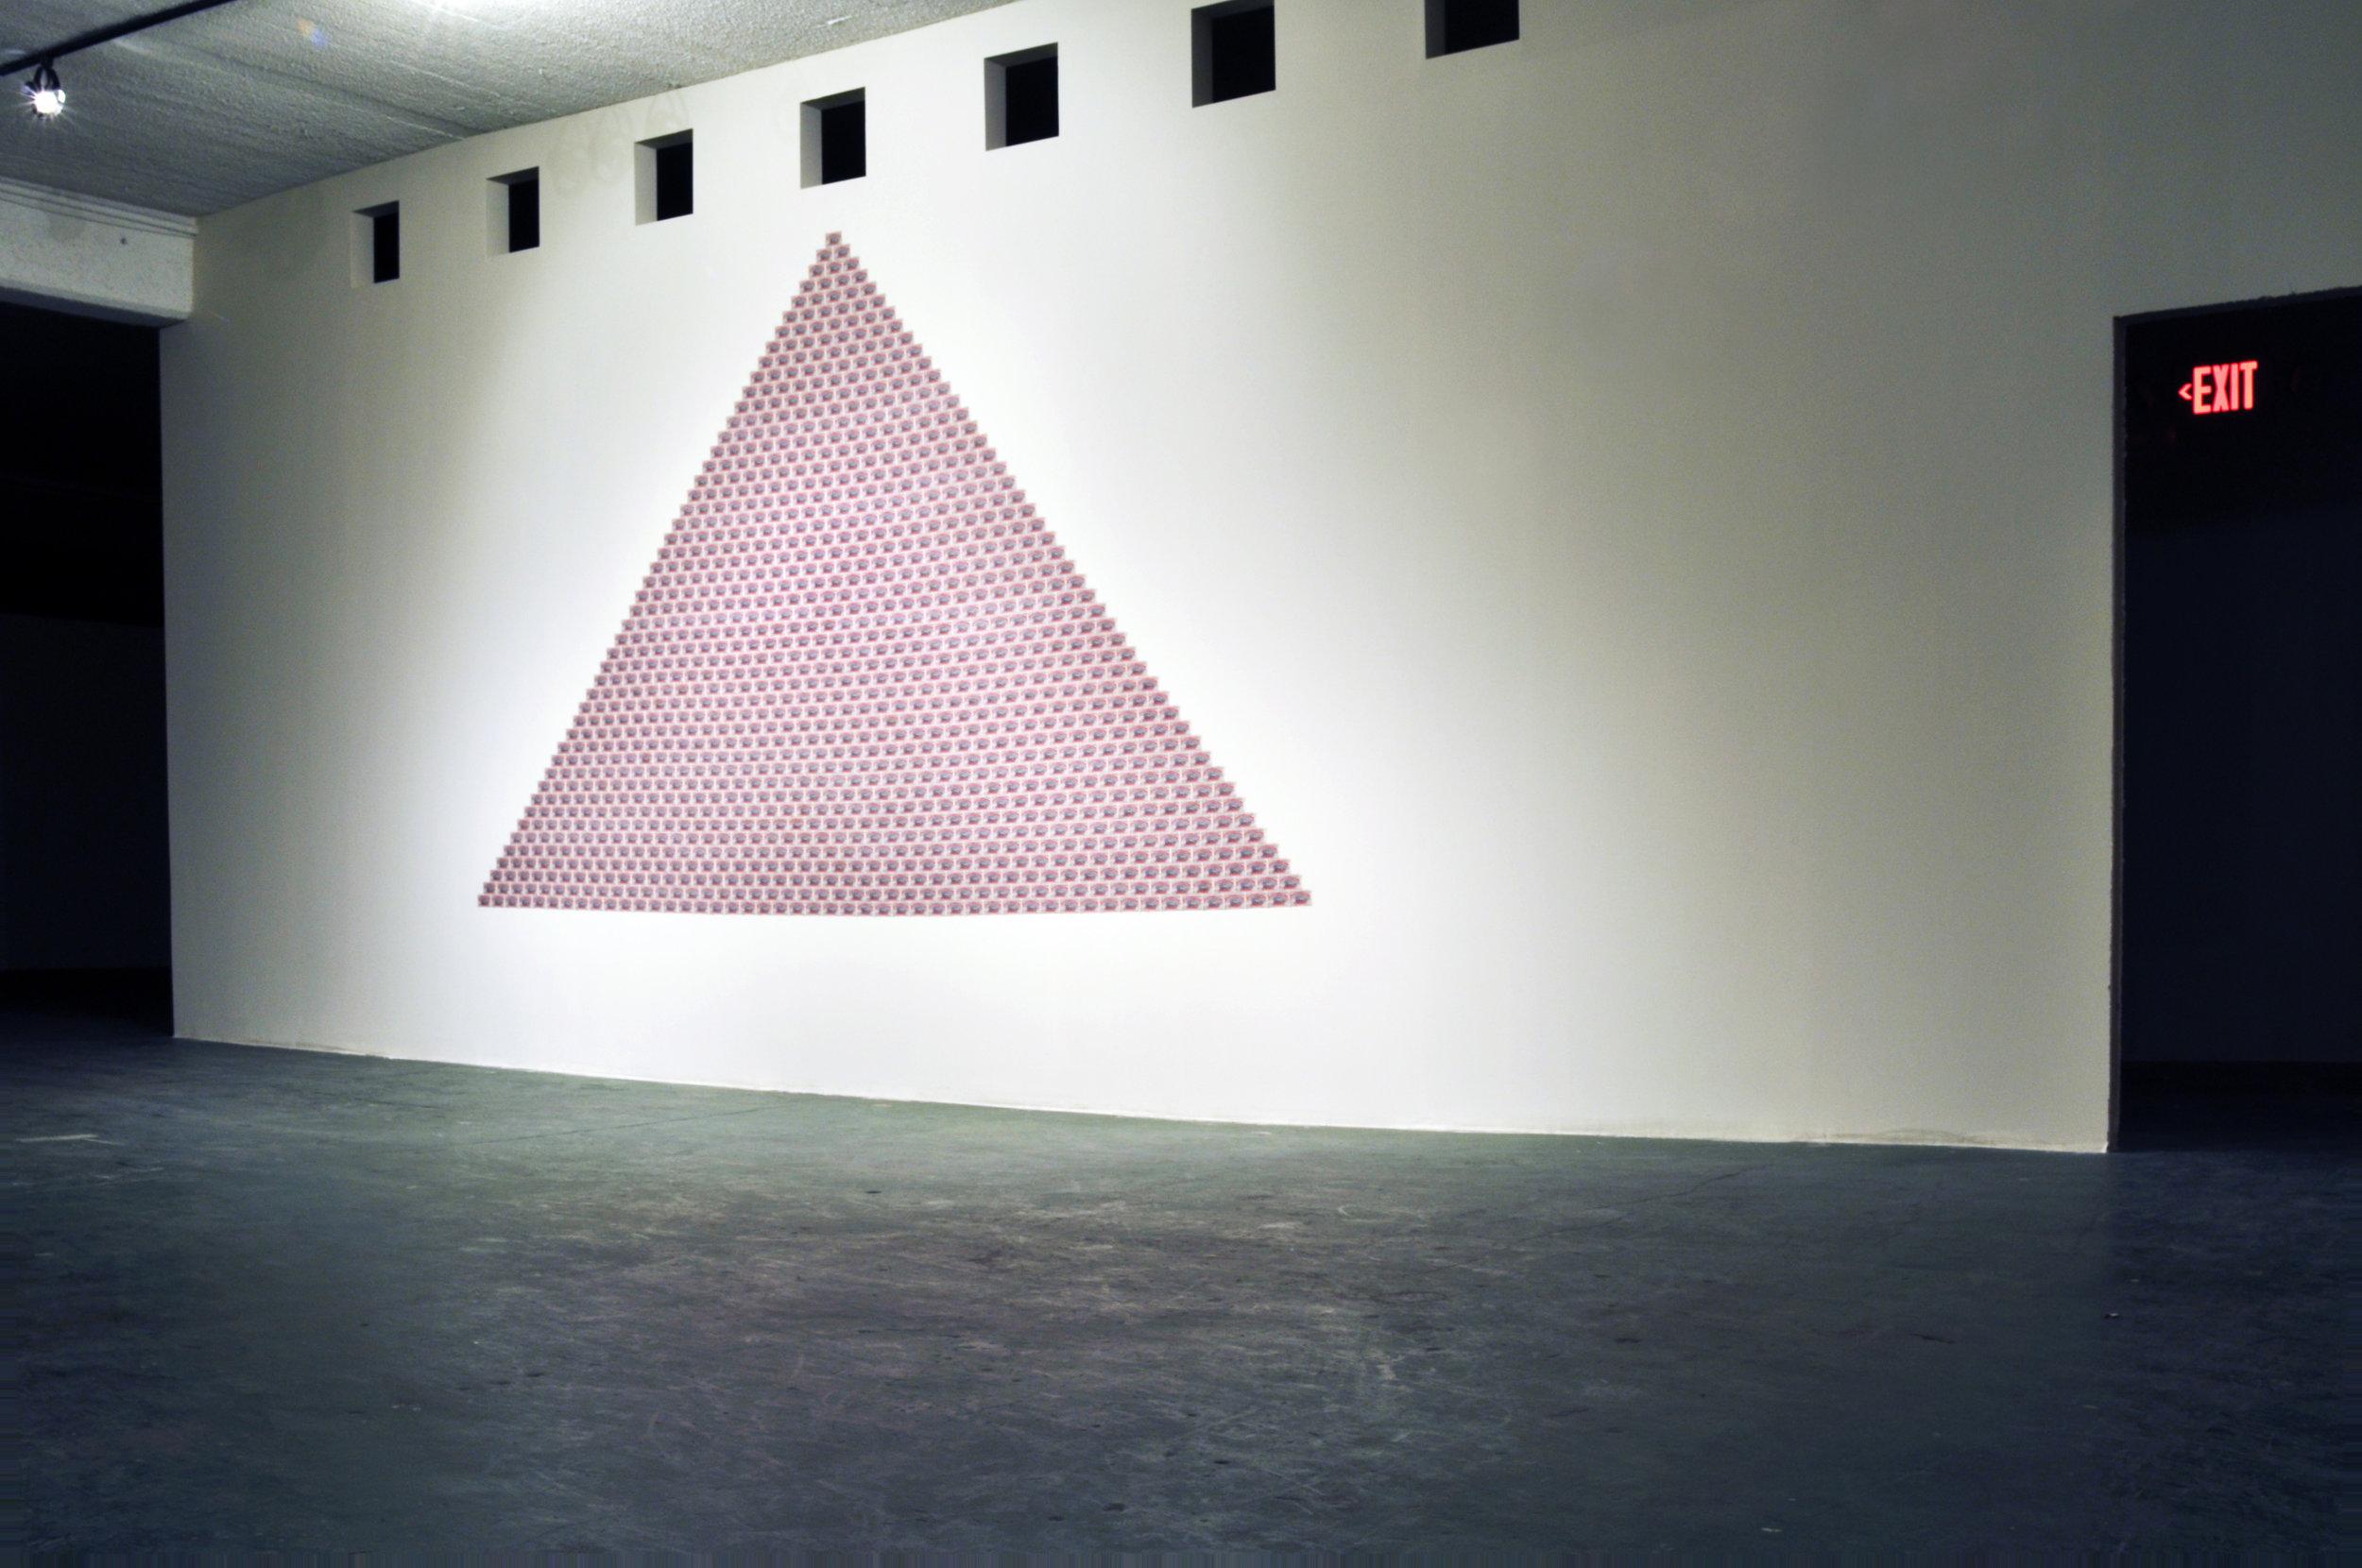 Susannah-Mira_Pyramid-Scheme_web.jpg